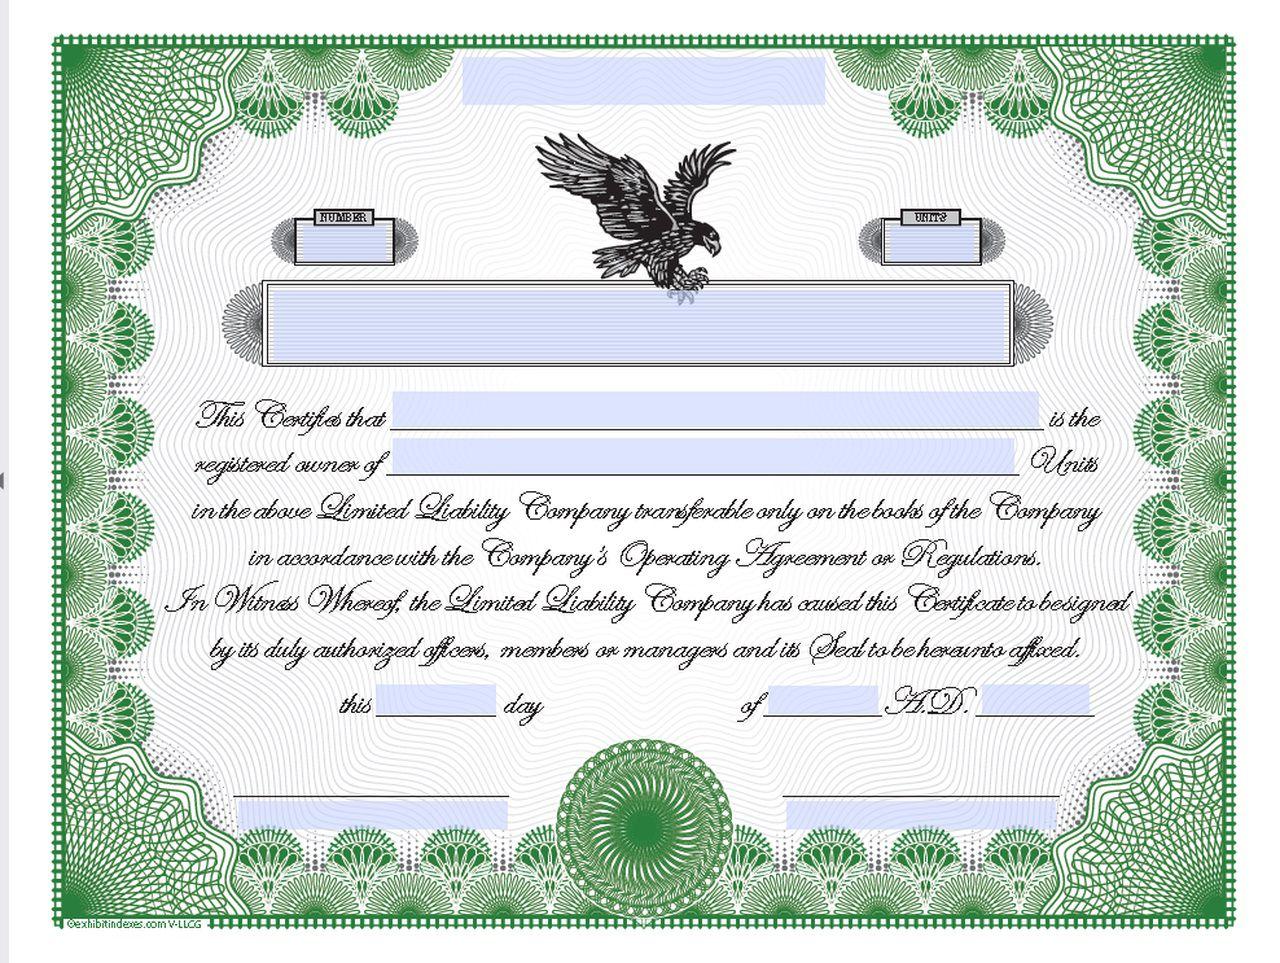 005 Top Llc Membership Certificate Template Example  Interest Free MemberFull